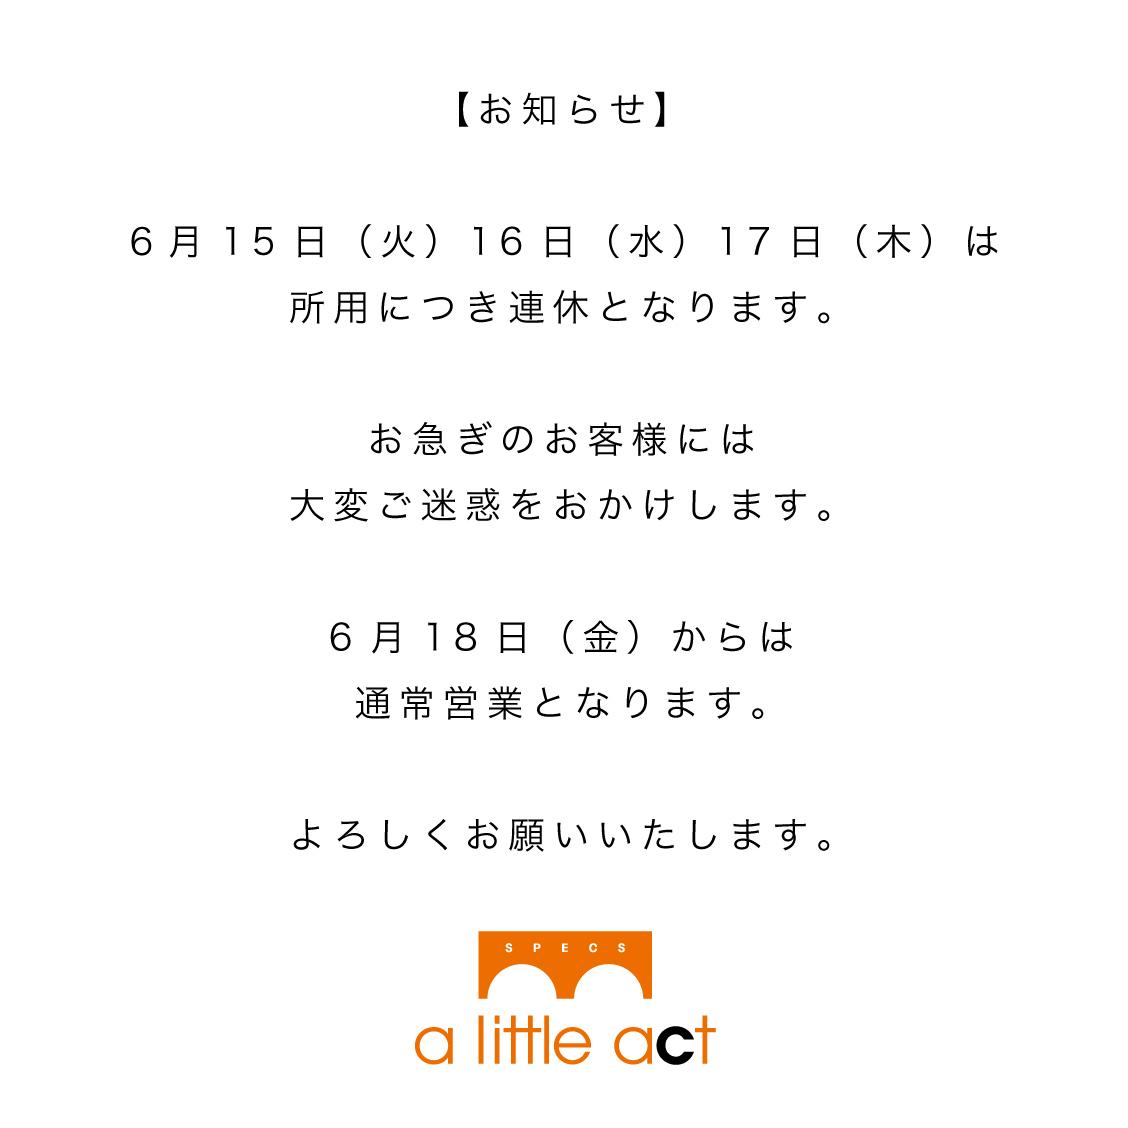 f:id:alittleact:20210614161225j:plain